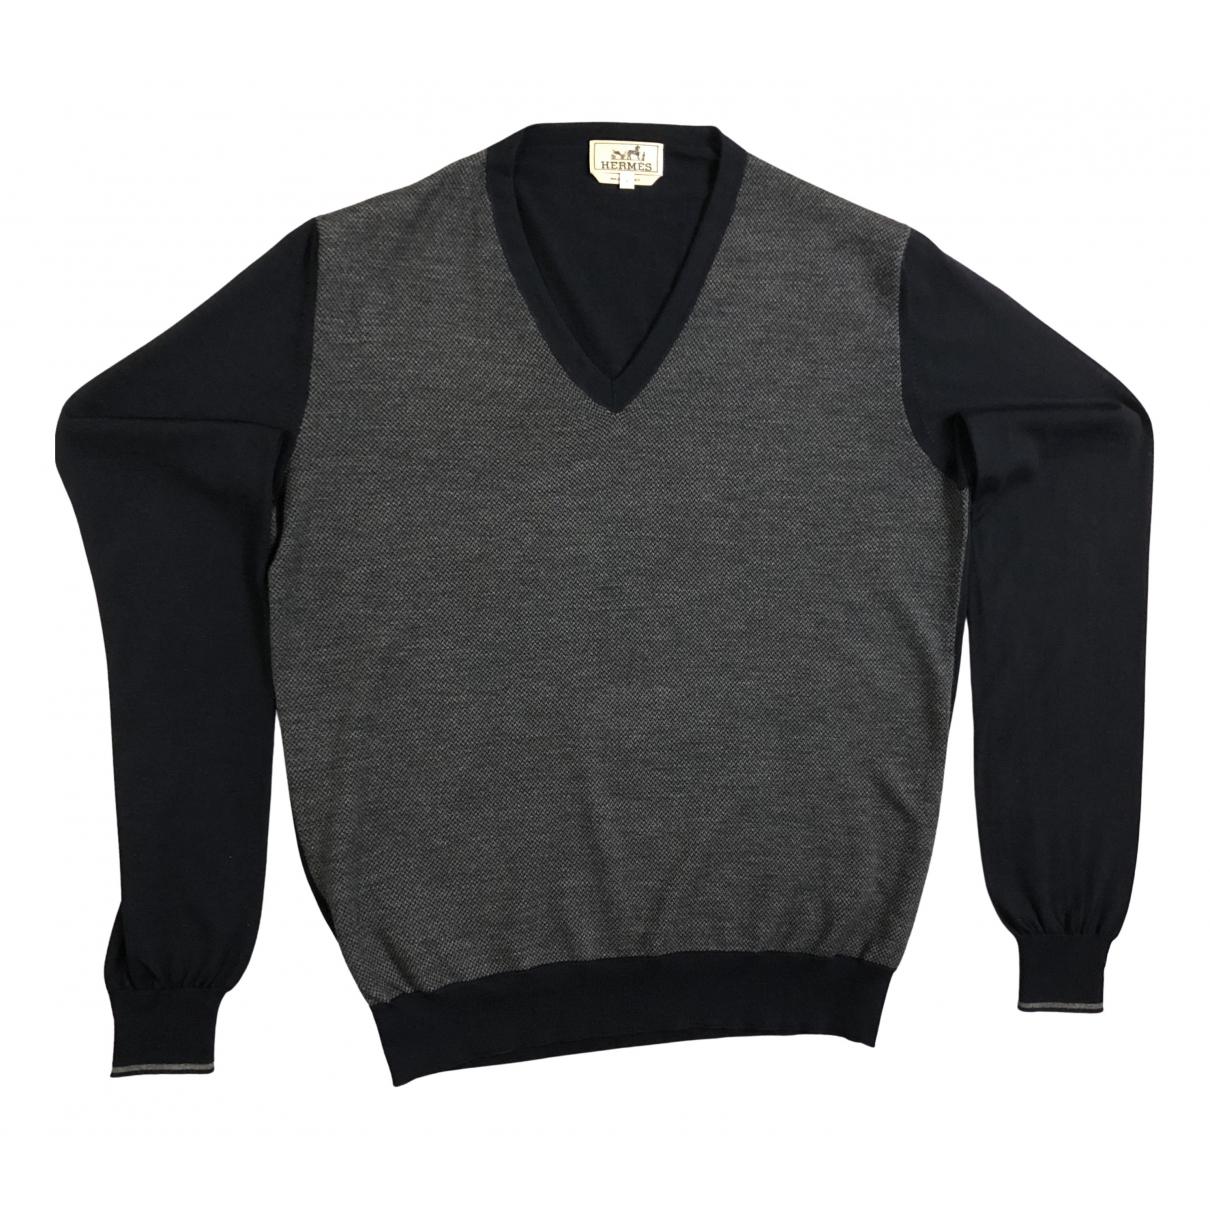 Hermès N Grey Cashmere Knitwear & Sweatshirts for Men L International